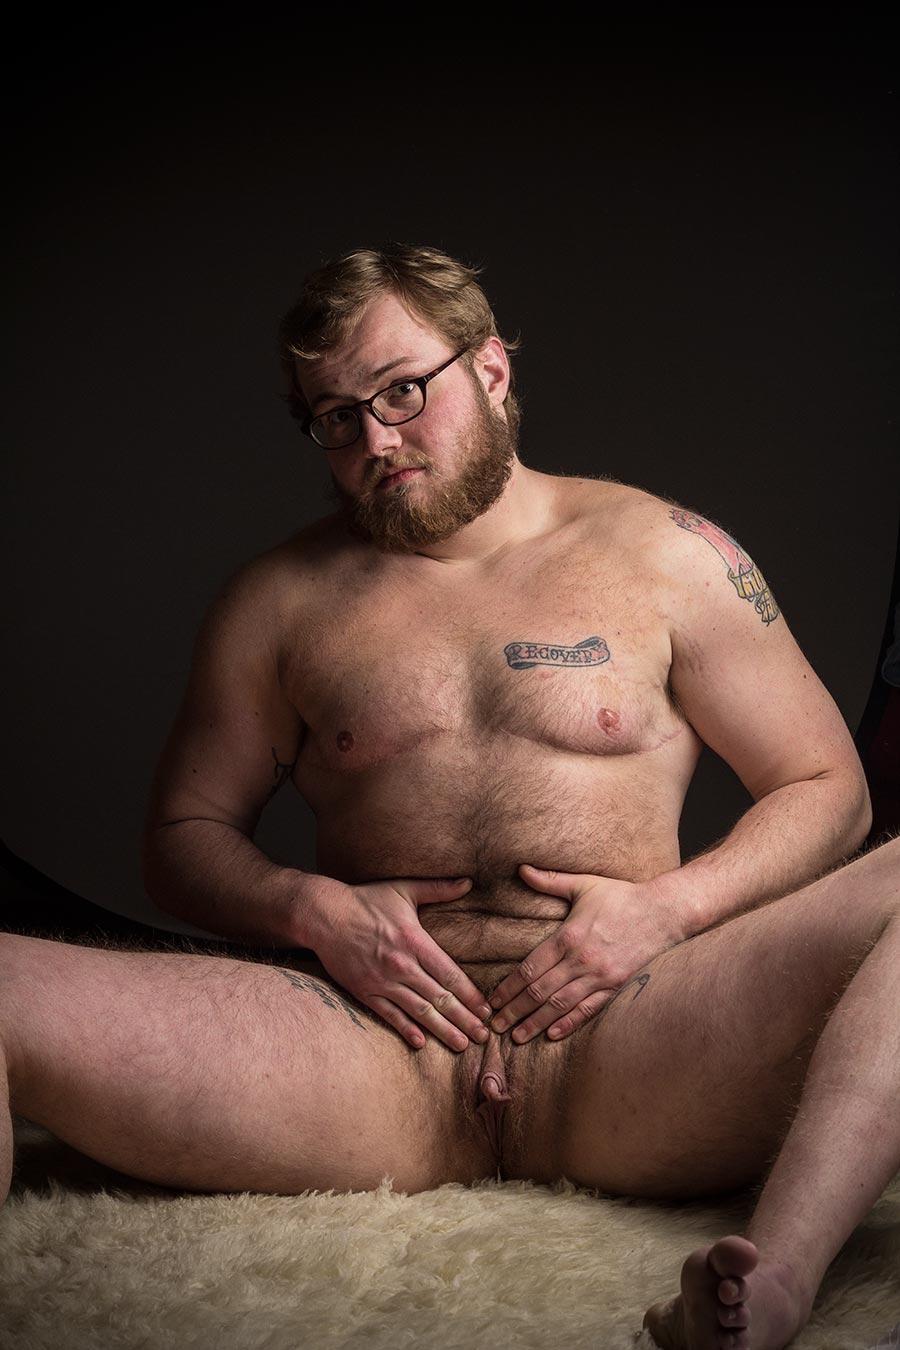 transseksuali-ftm